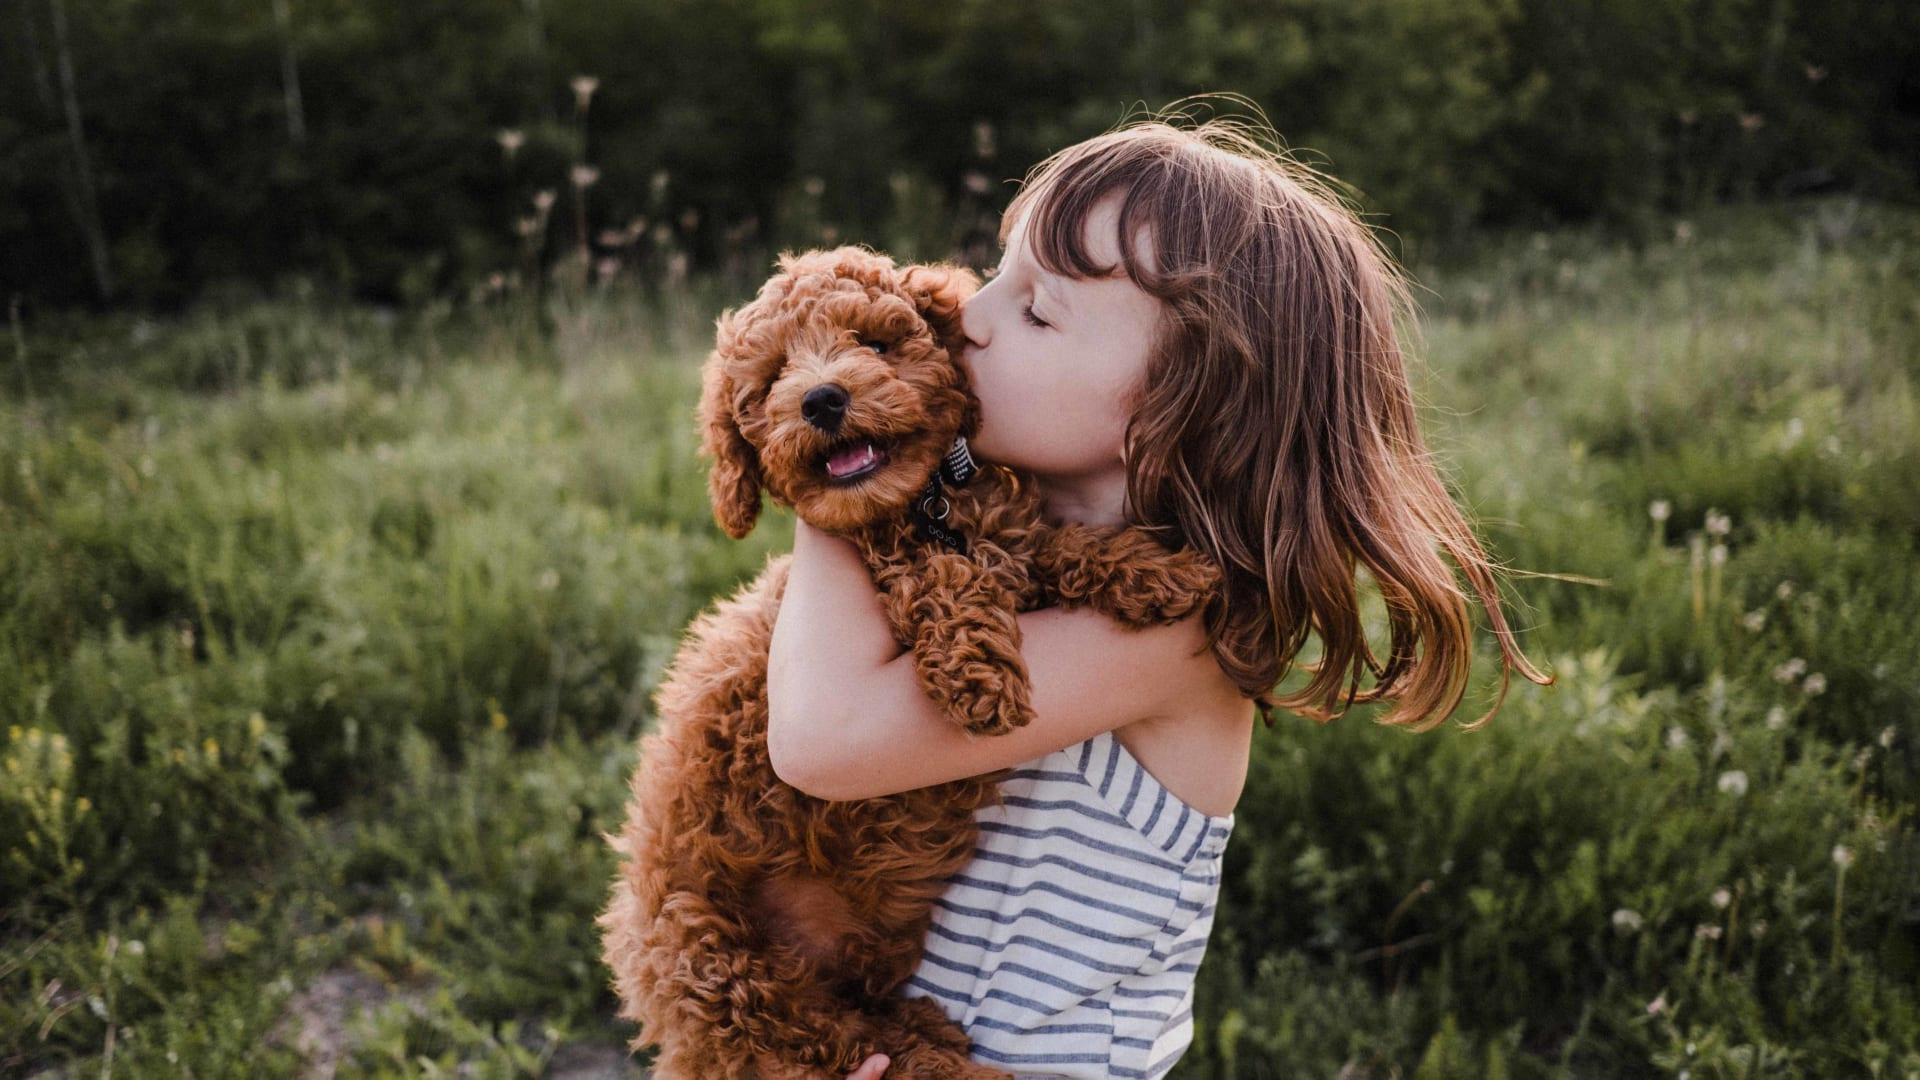 The Counterintuitive Secret to Raising Kind Kids